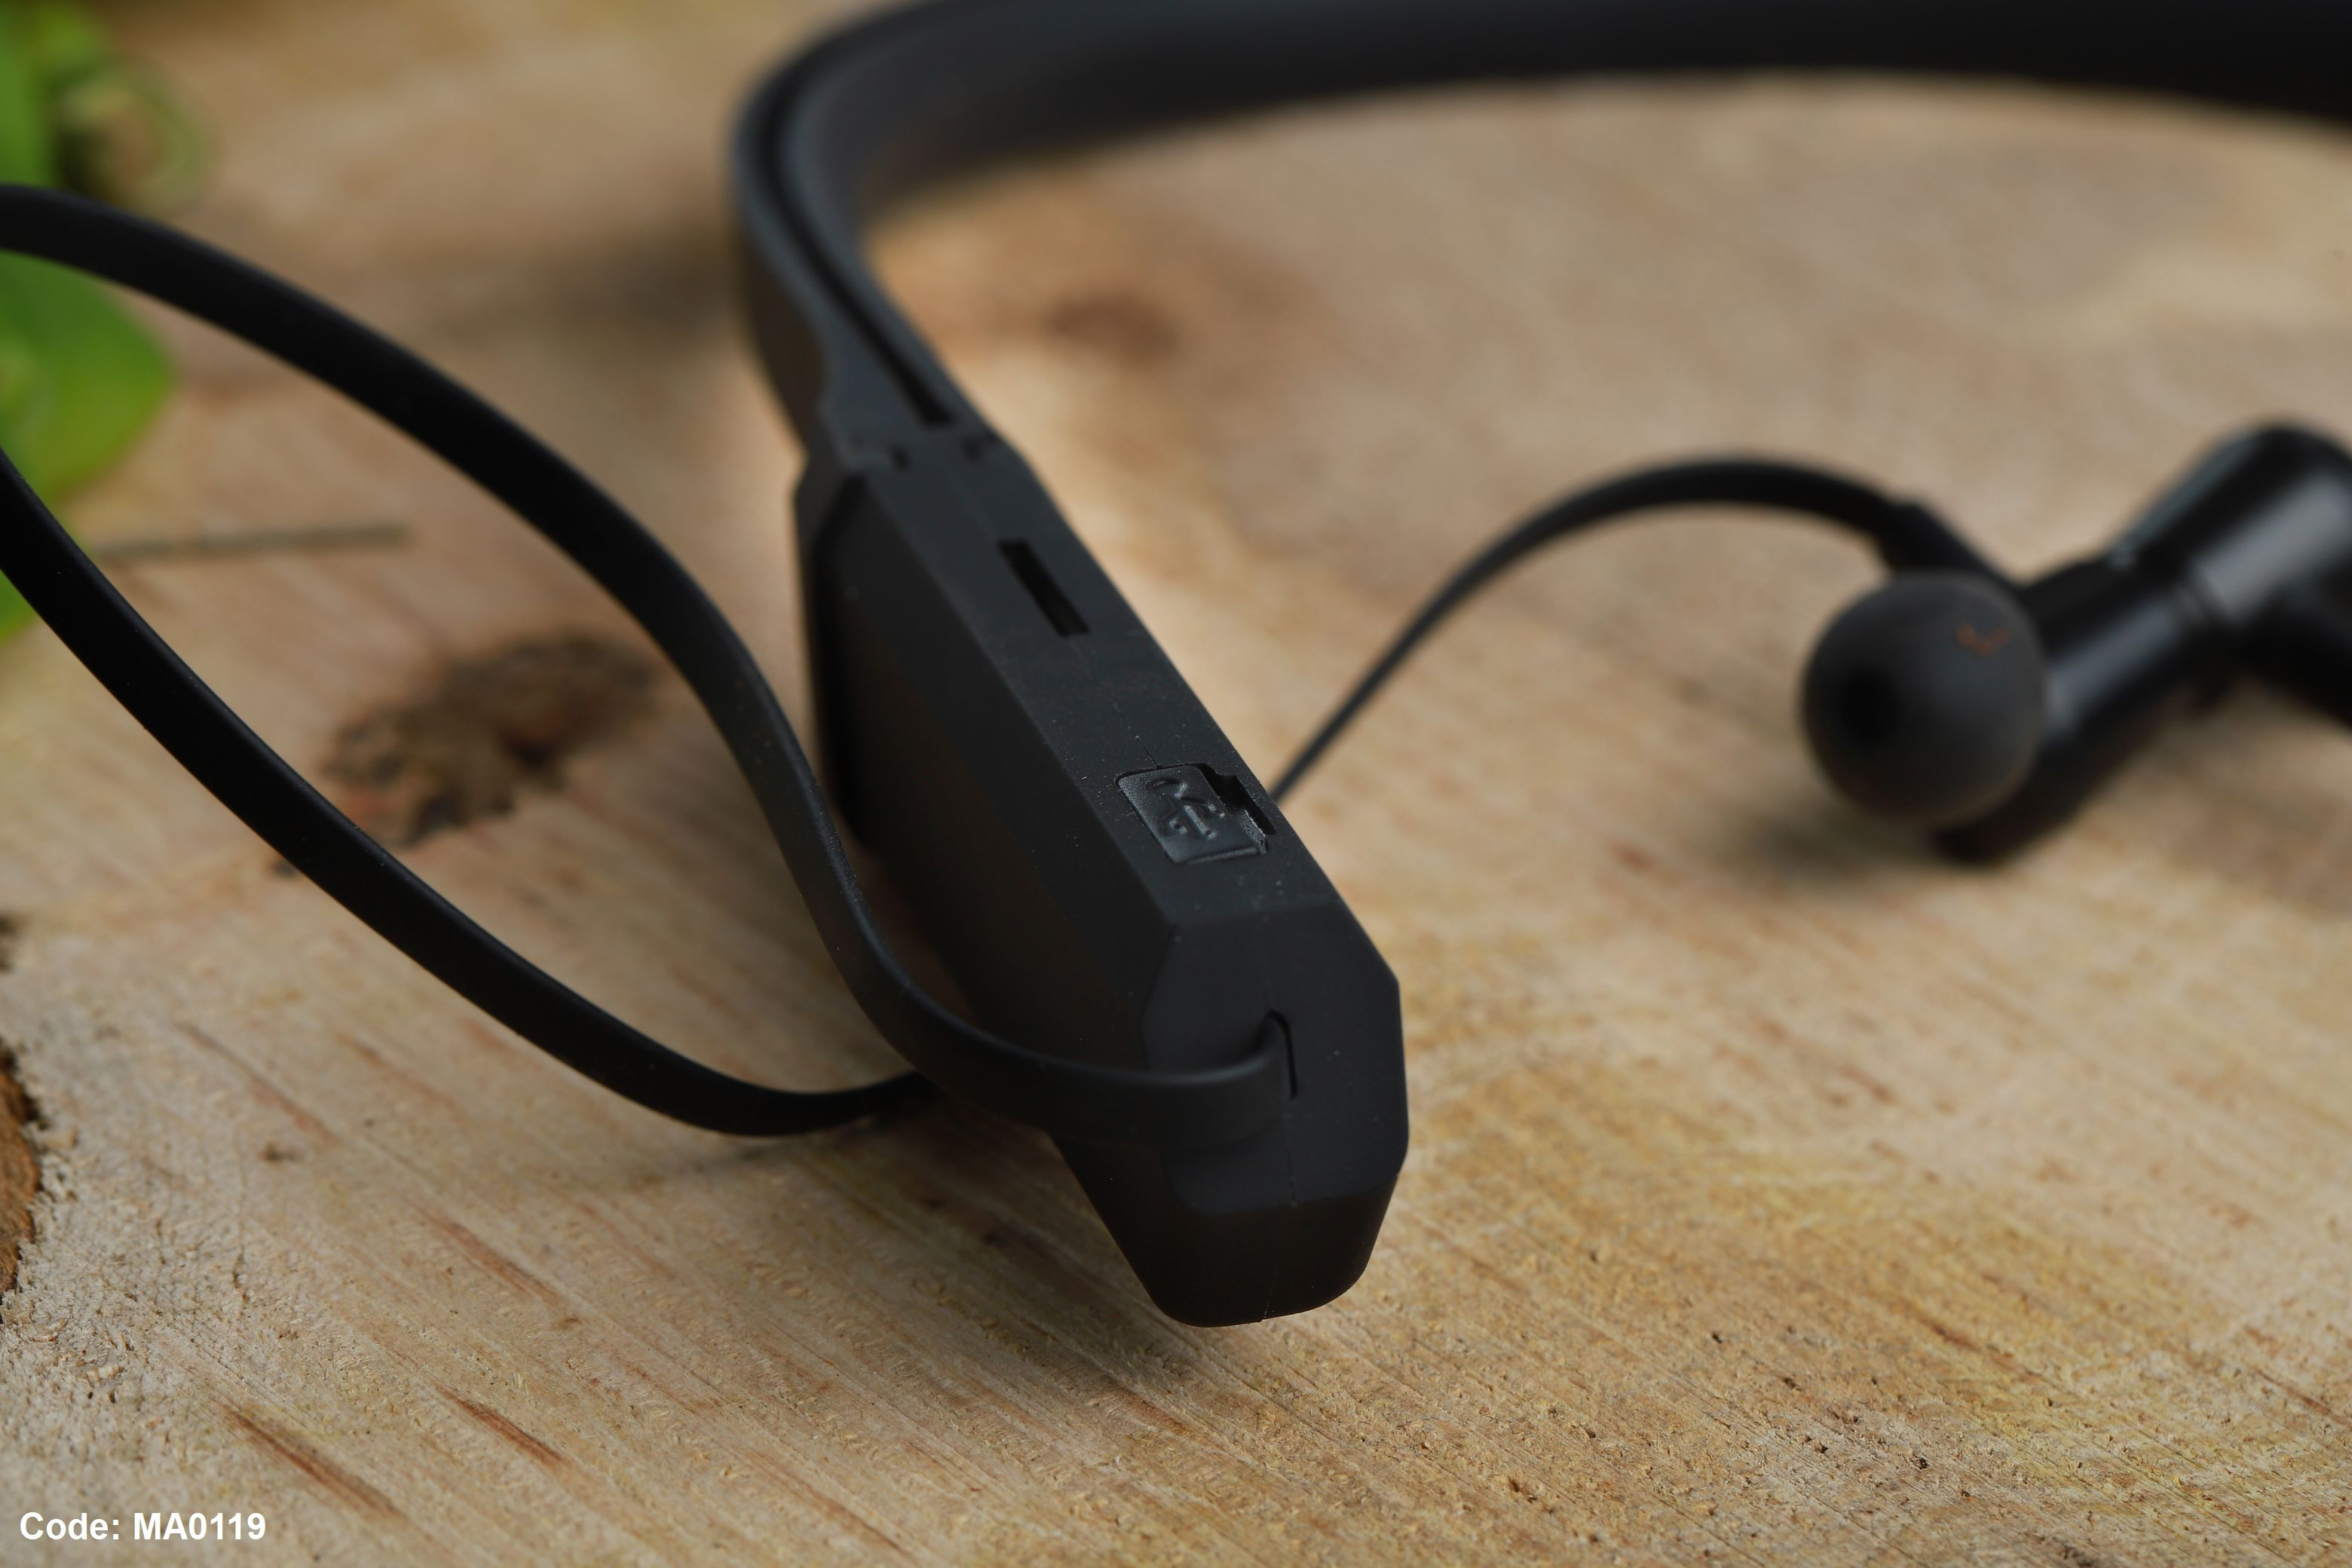 Bluetooth Headphones Favio H26 بسعر 255ج بدل من 430ج Phone Accessories Headphones Earbuds